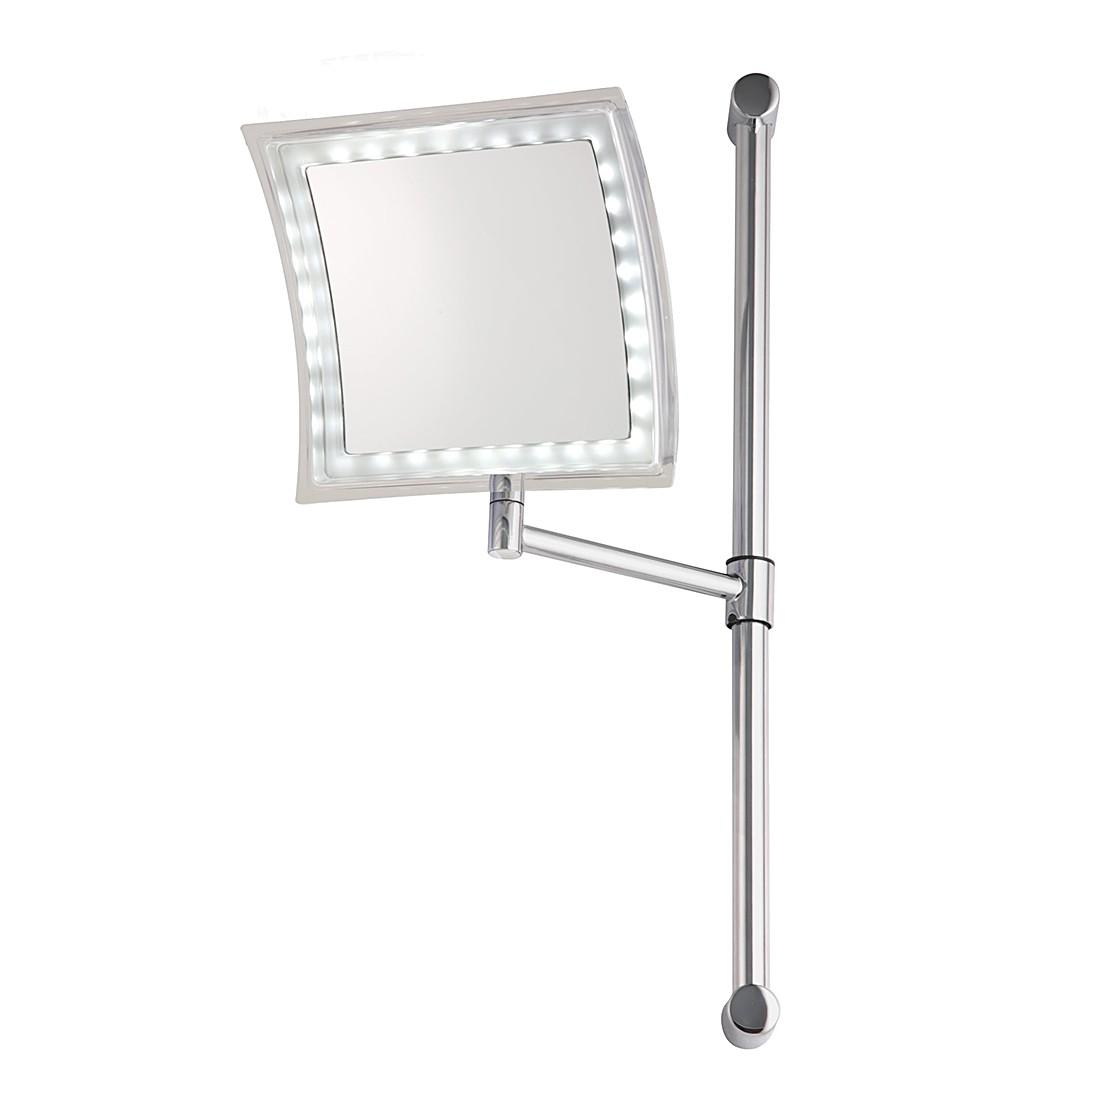 Wandspiegel Tessa – Silber, LED-Beleuchtung, 5-fache Vergrößerung, Sanwood günstig online kaufen